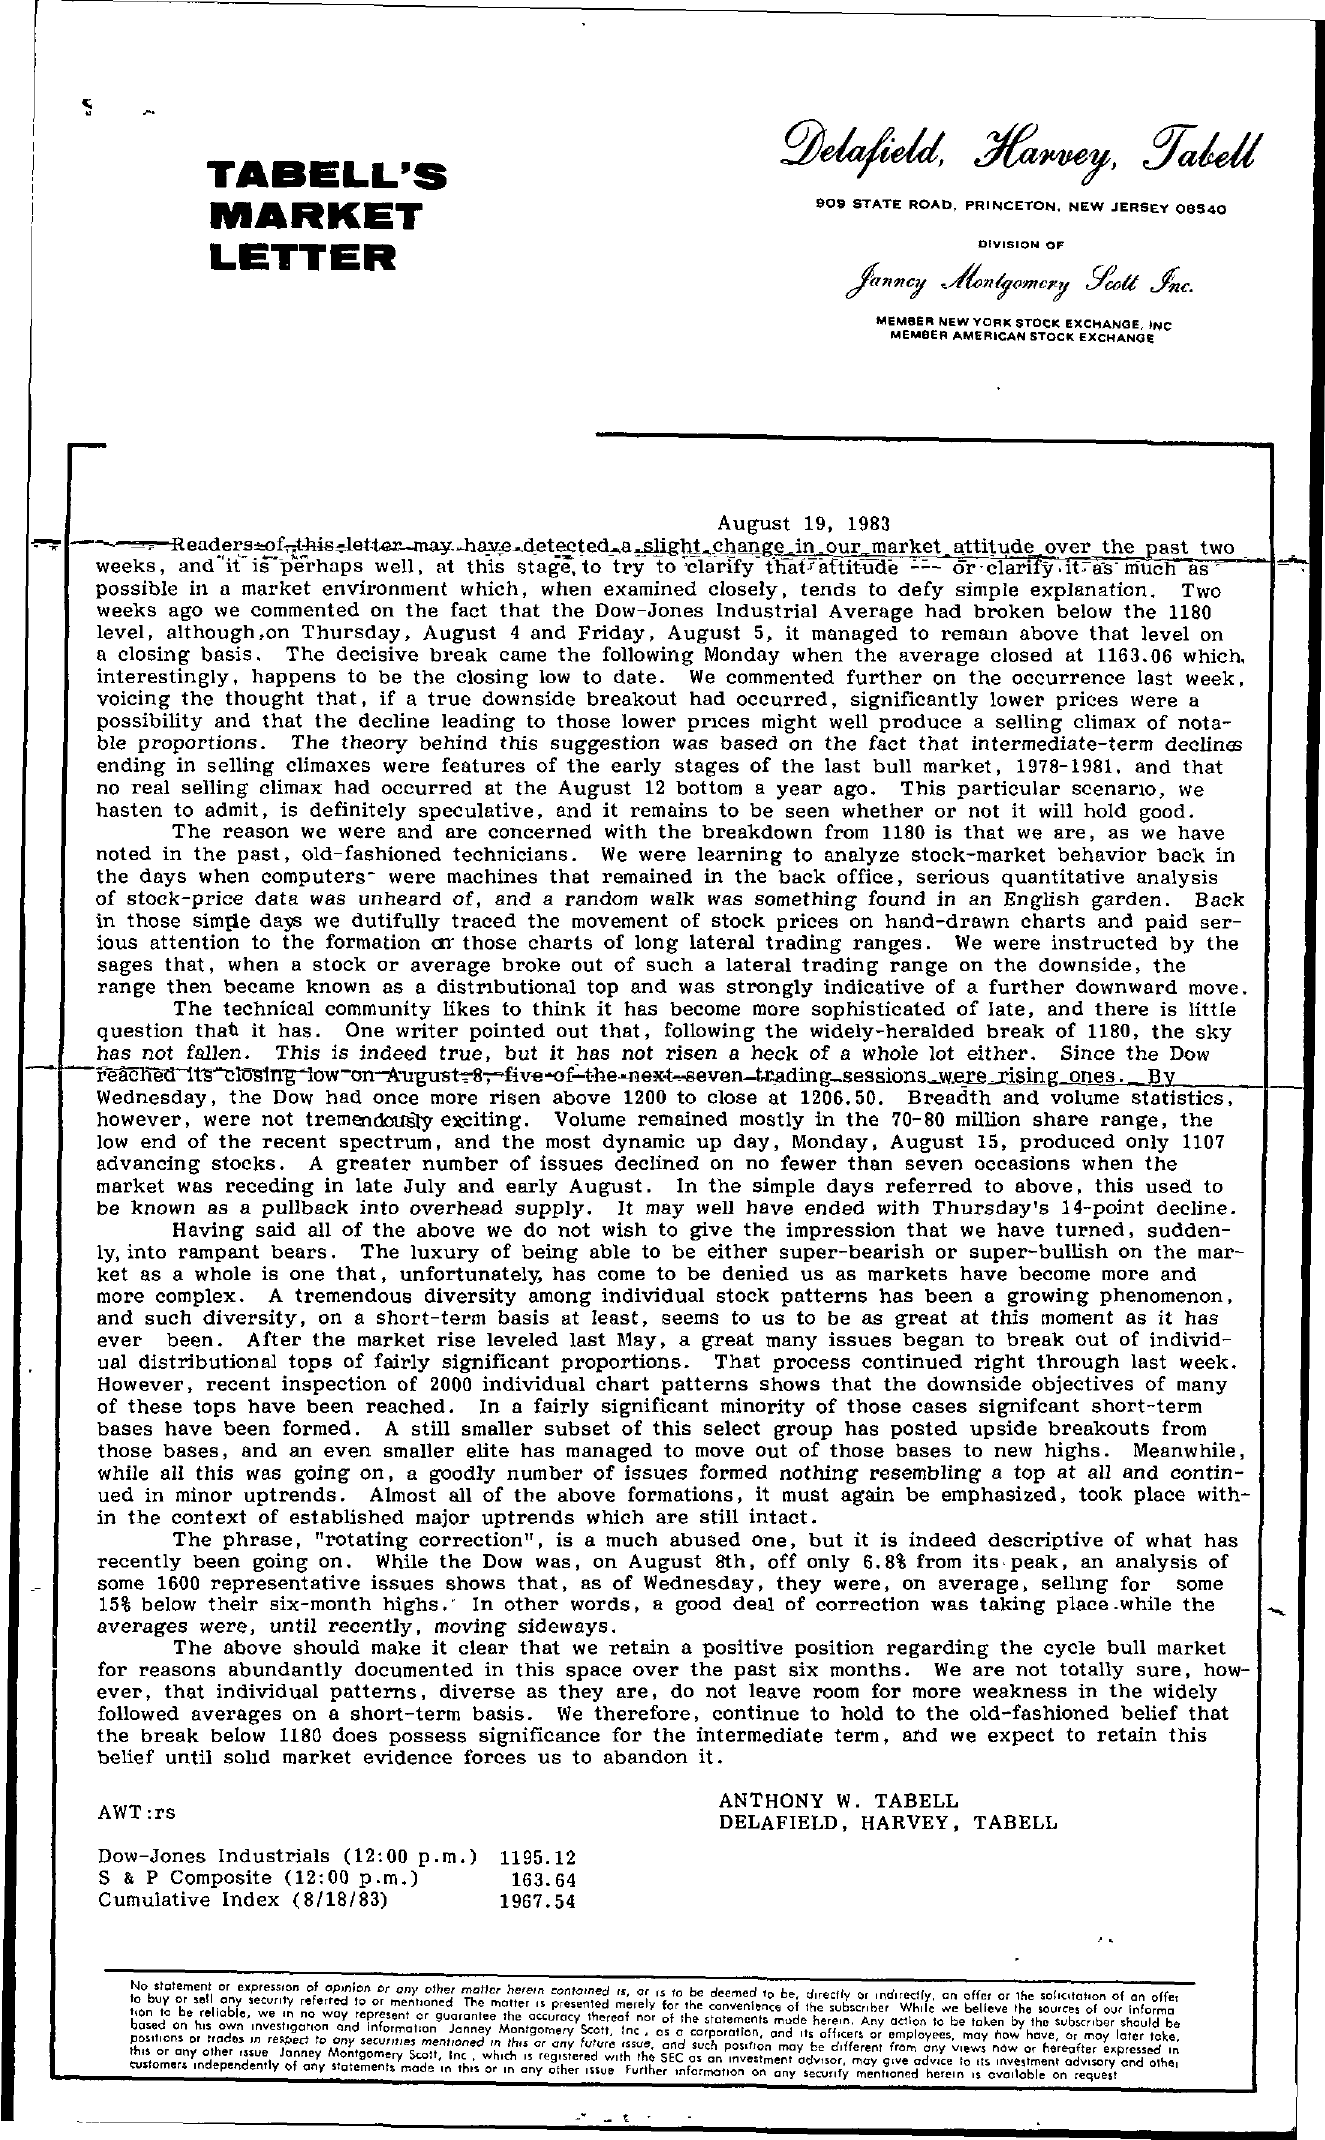 Tabell's Market Letter - August 19, 1983